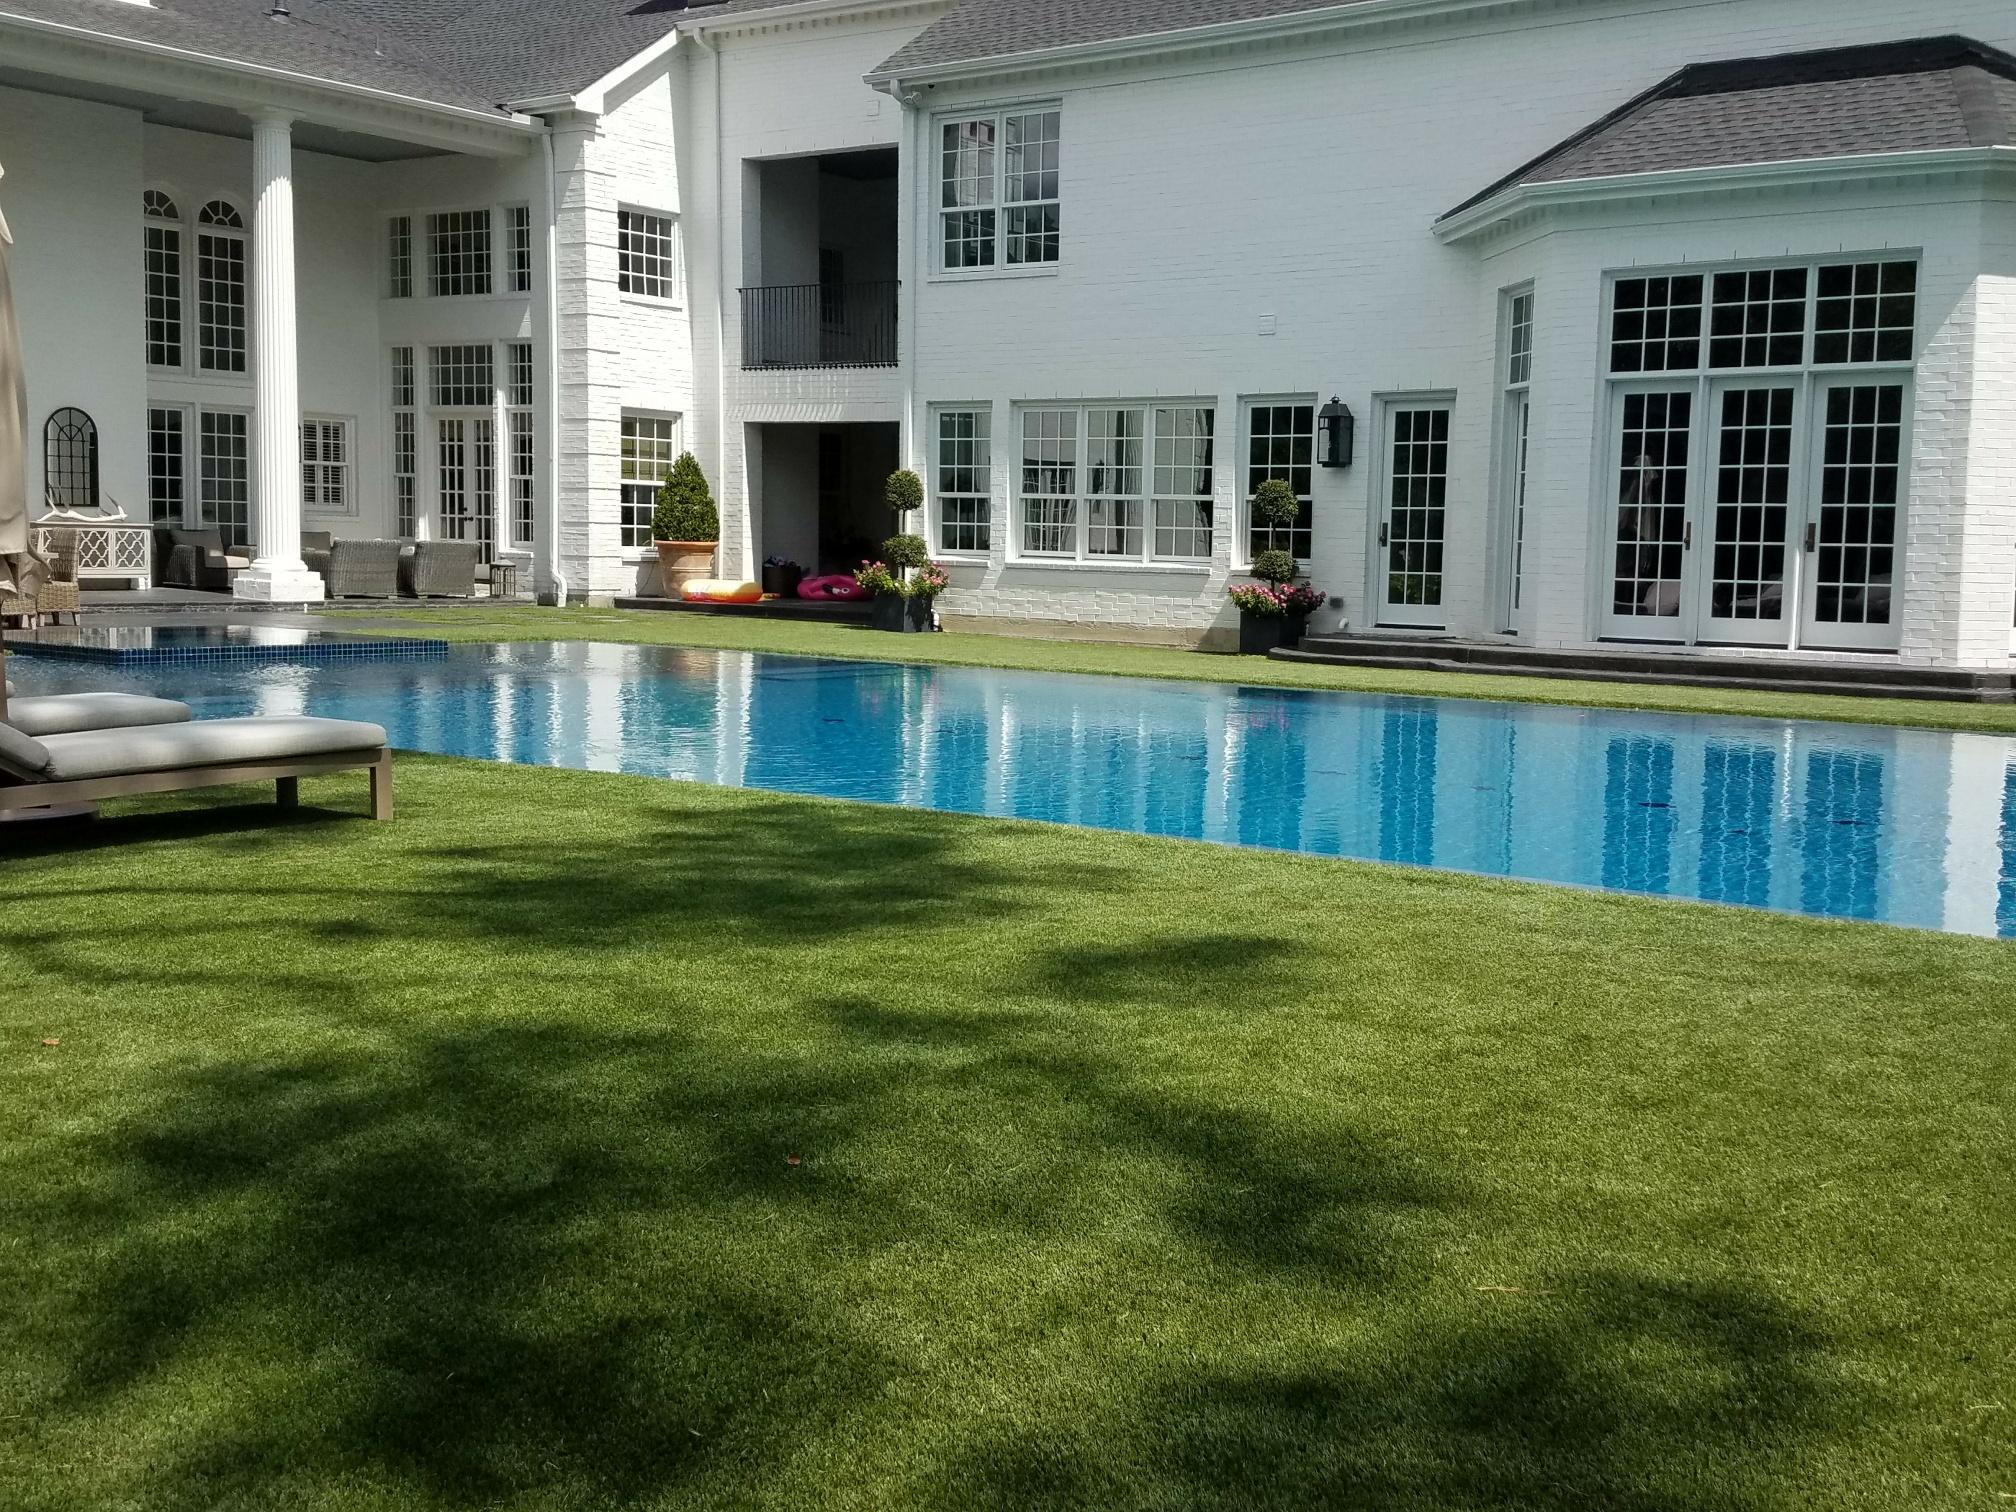 zero edge pool with artificial grass surround